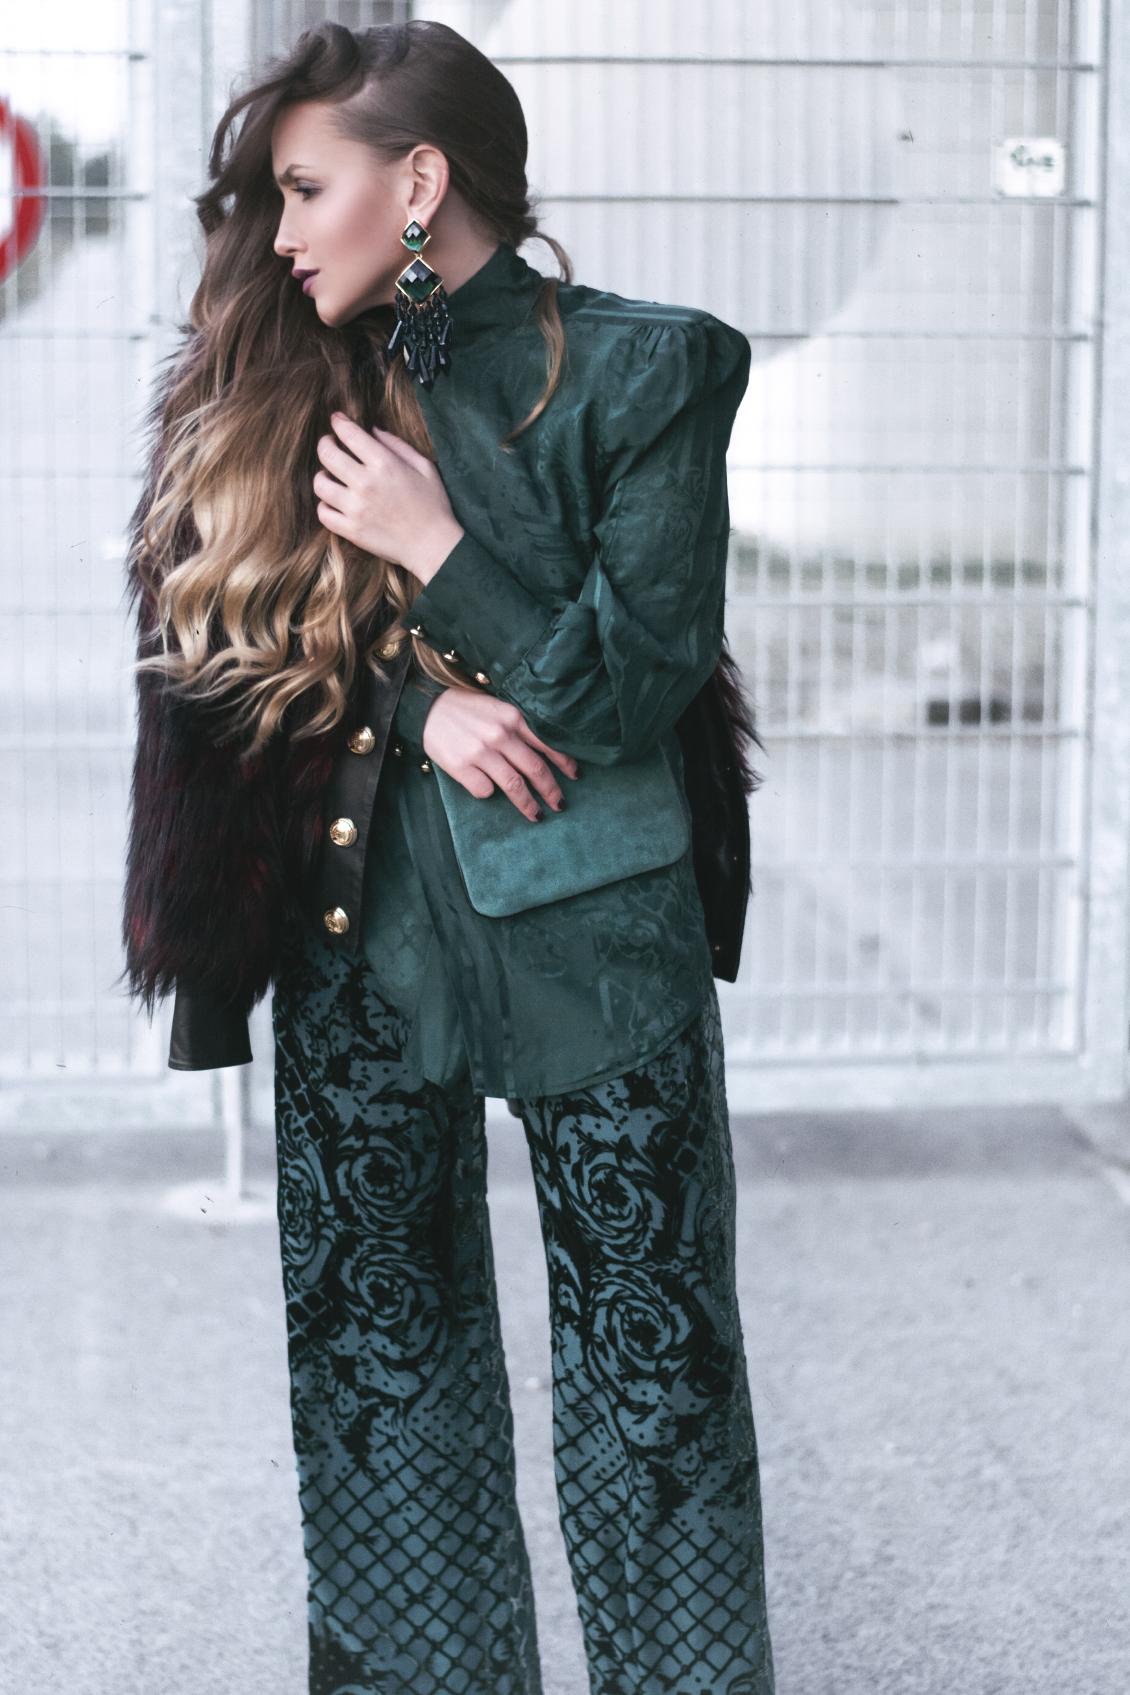 Balmain x H&M Kollektion grüne Bluse